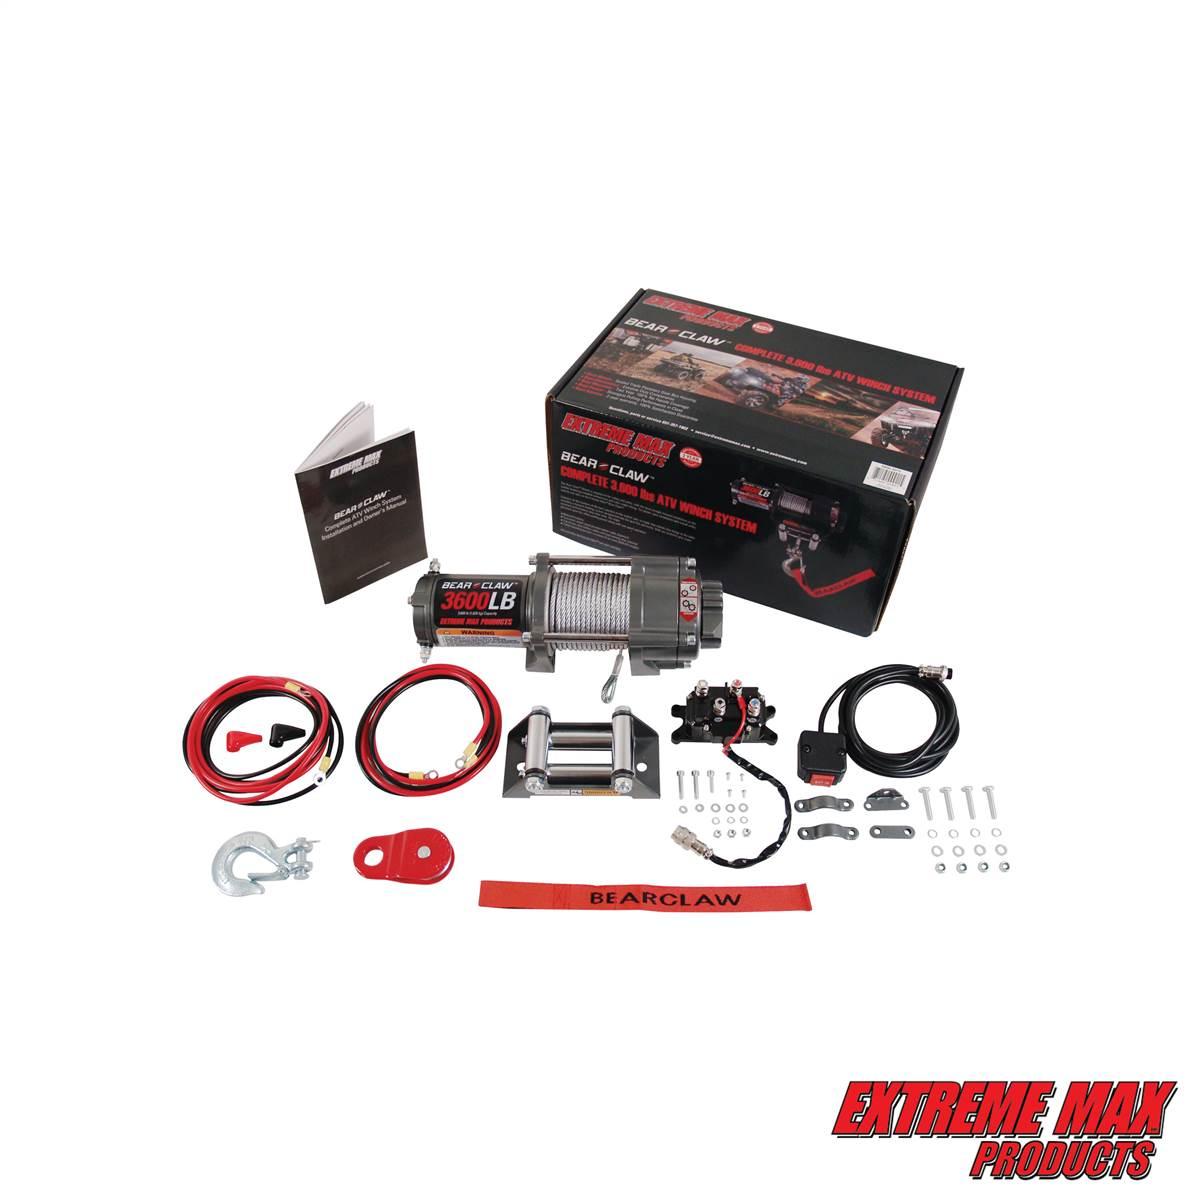 Extreme Max 5600 3075 Bear Claw ATV Winch - 3600 lb